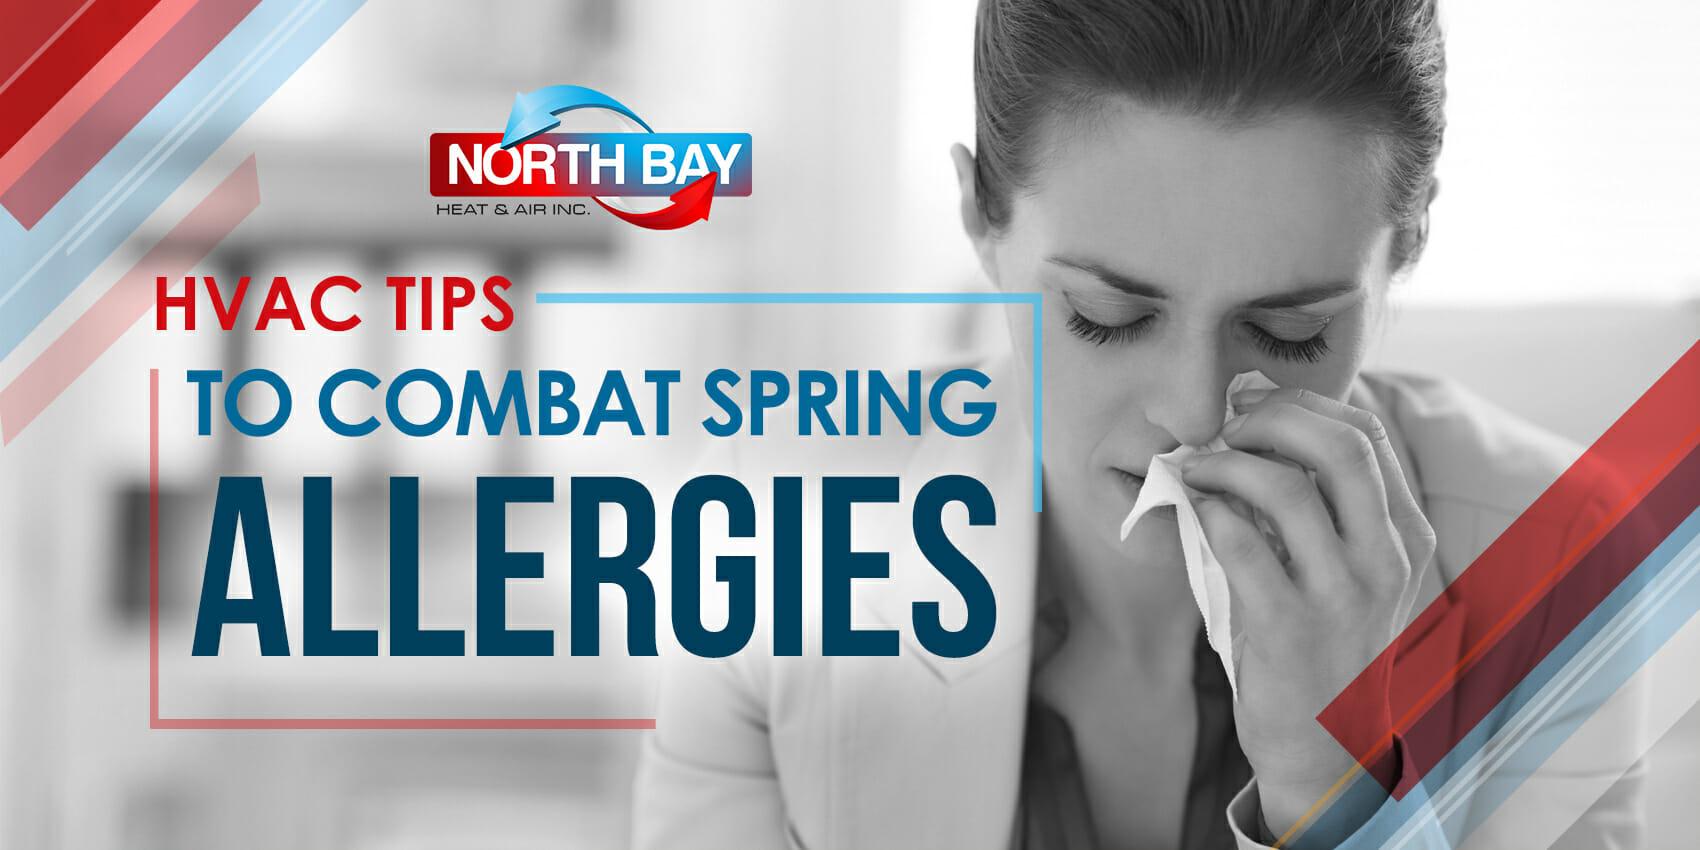 HVAC Tips To Combat Spring Allergies